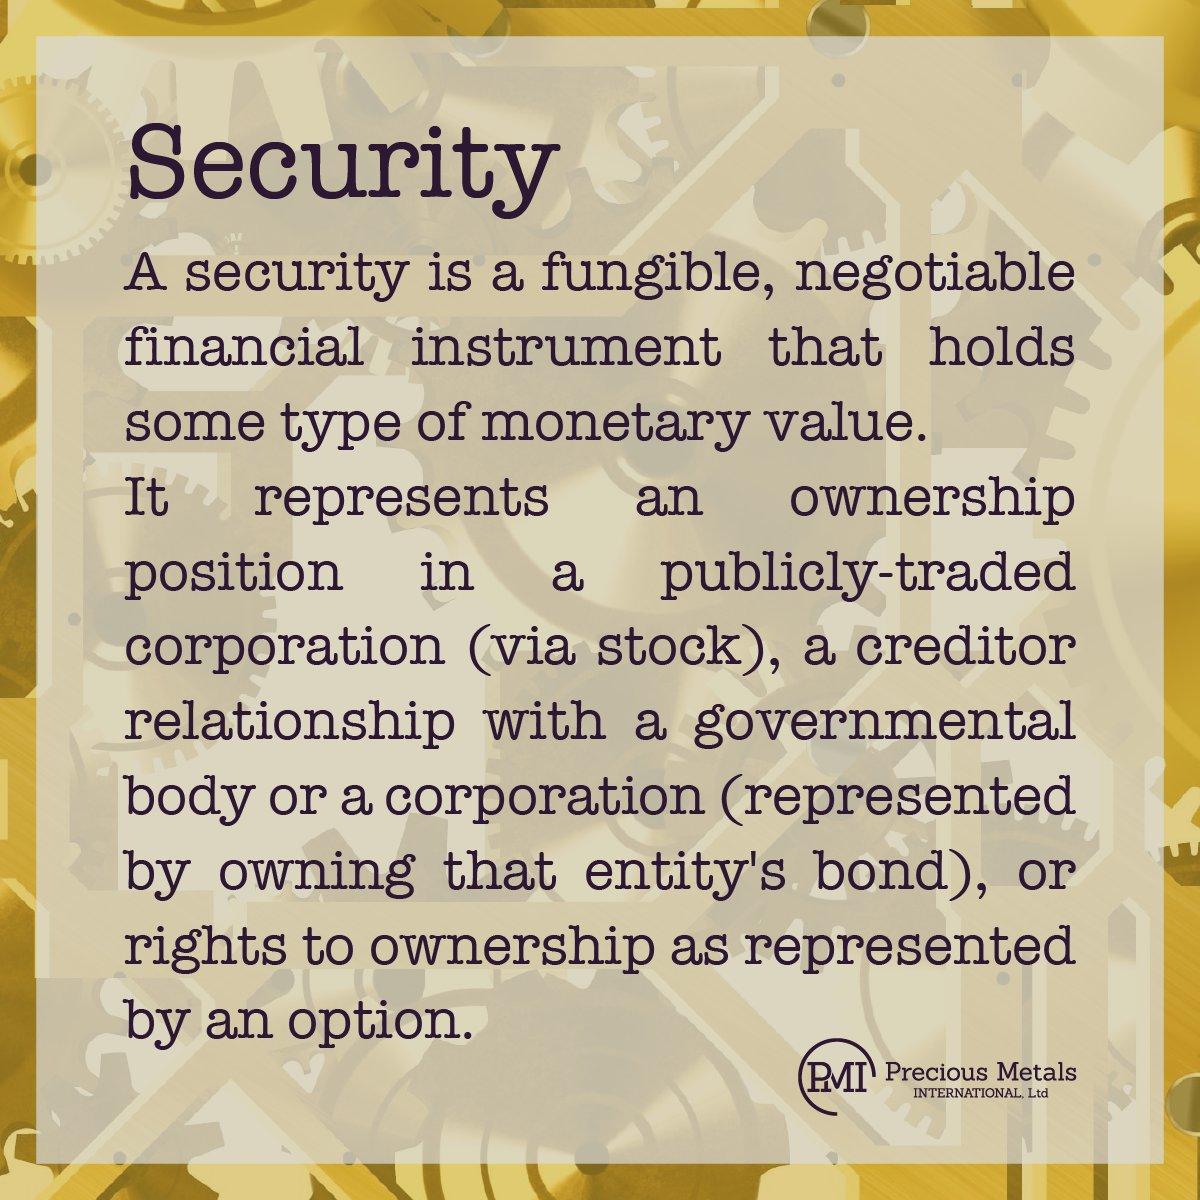 #BullionPMI  #Definition  #Security  #FinancialInstrument  #Stocks  #Bonds  #Investing  #Investment  📈